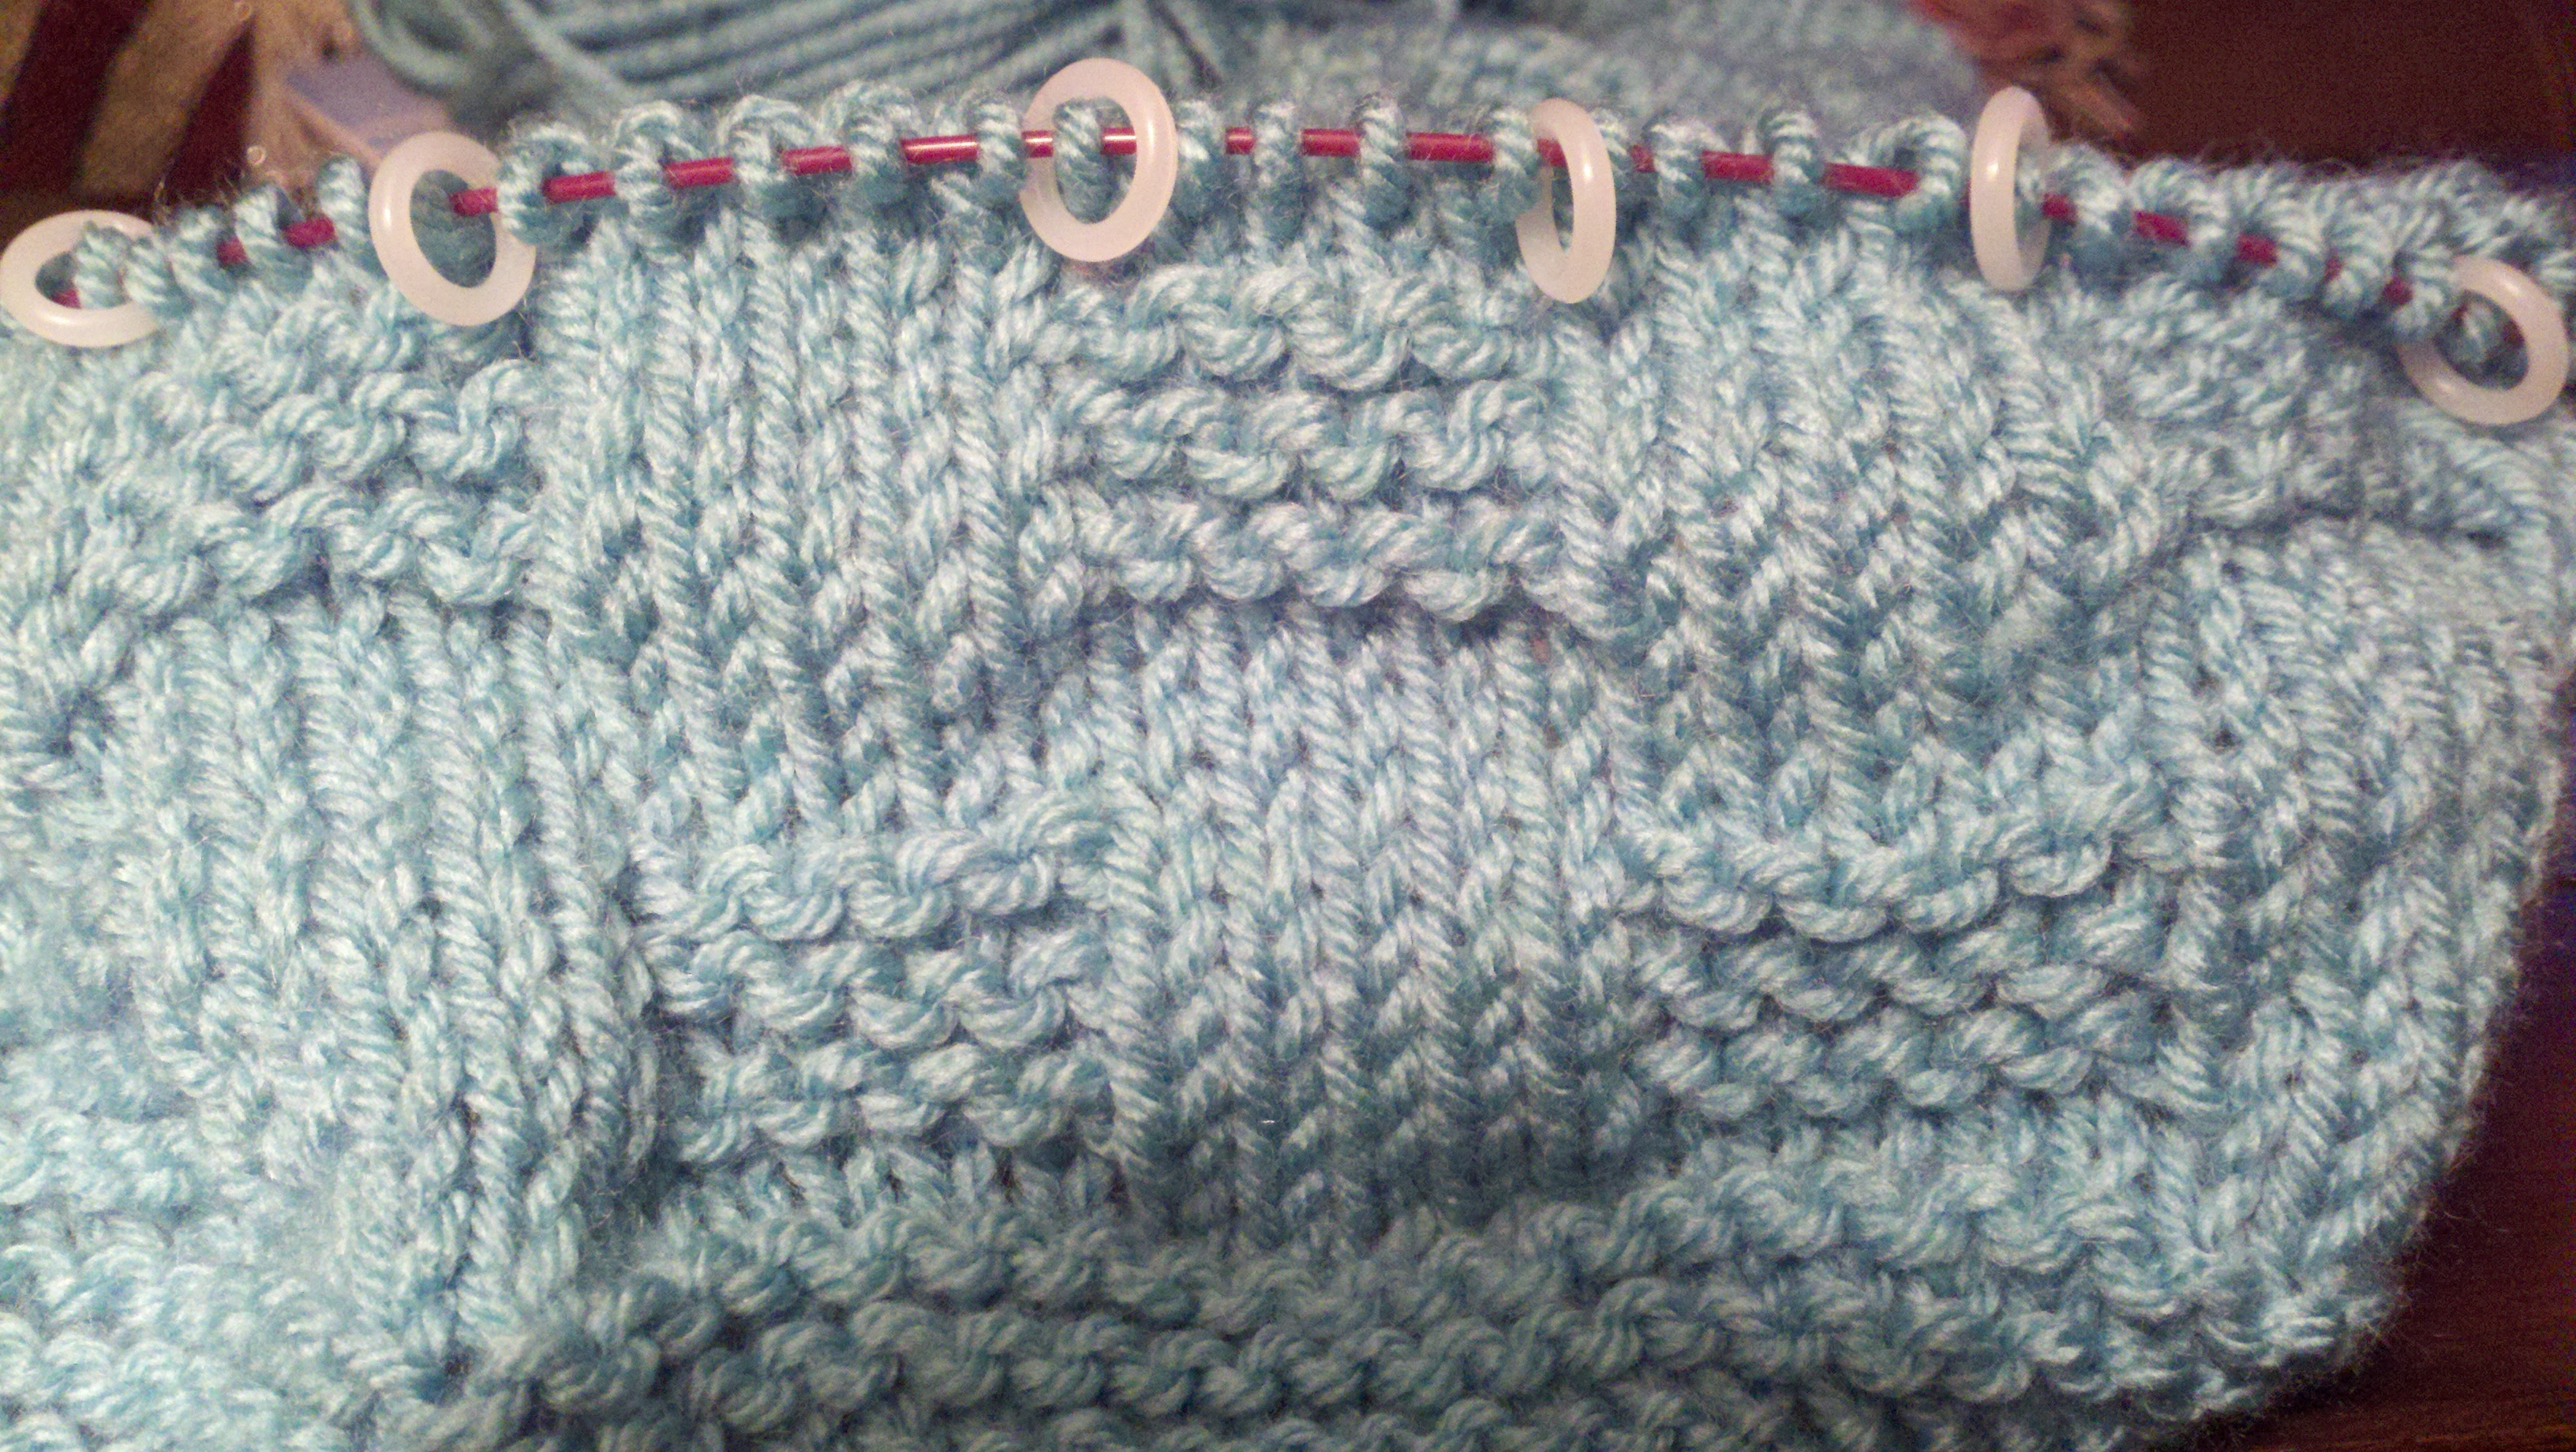 Knitting Patterns For A Baby Blanket : knit baby blanket pattern writeknit